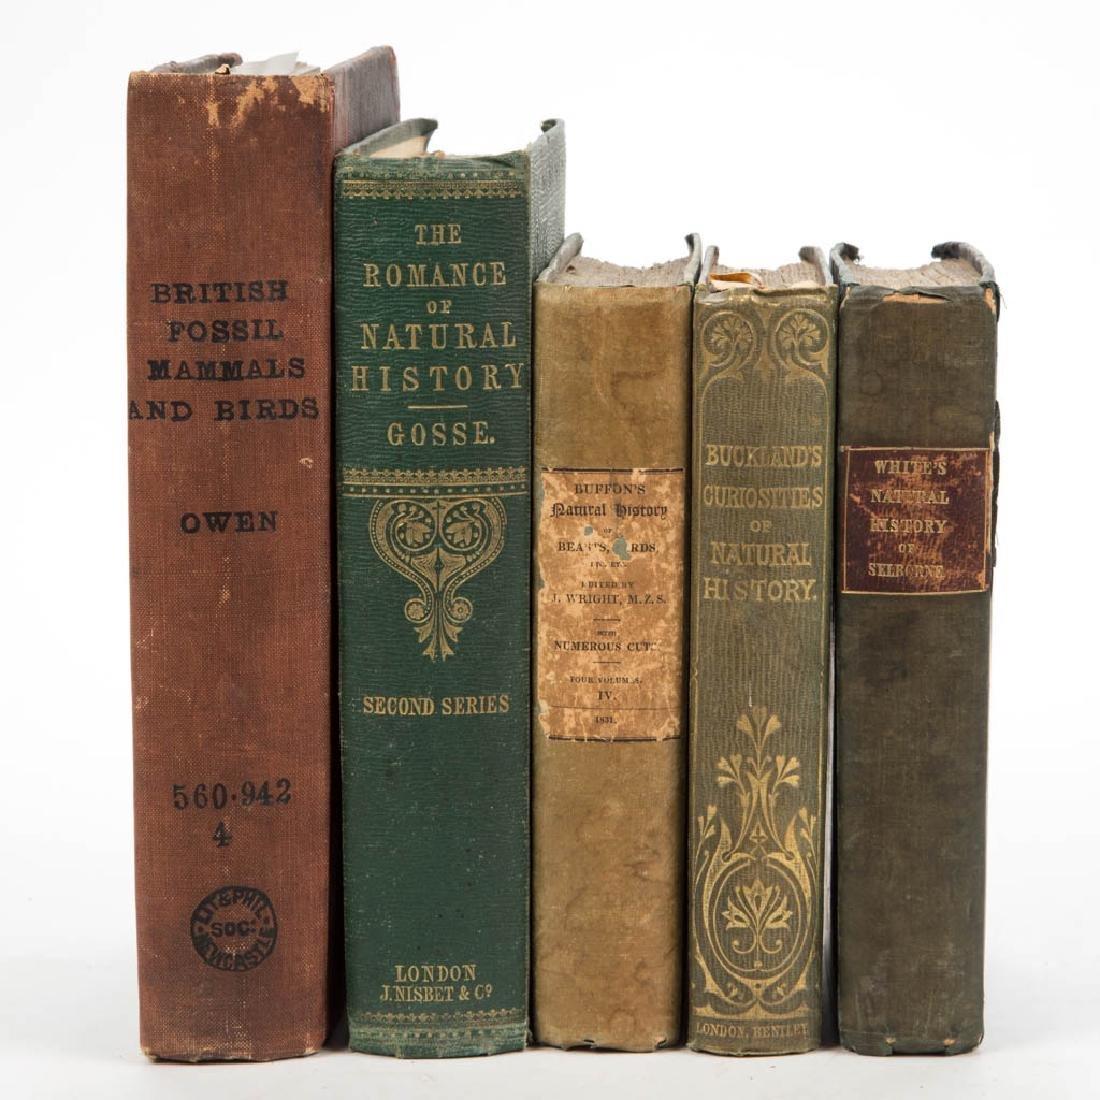 BRITISH HISTORICAL NATURAL HISTORY VOLUMES, LOT OF FIVE